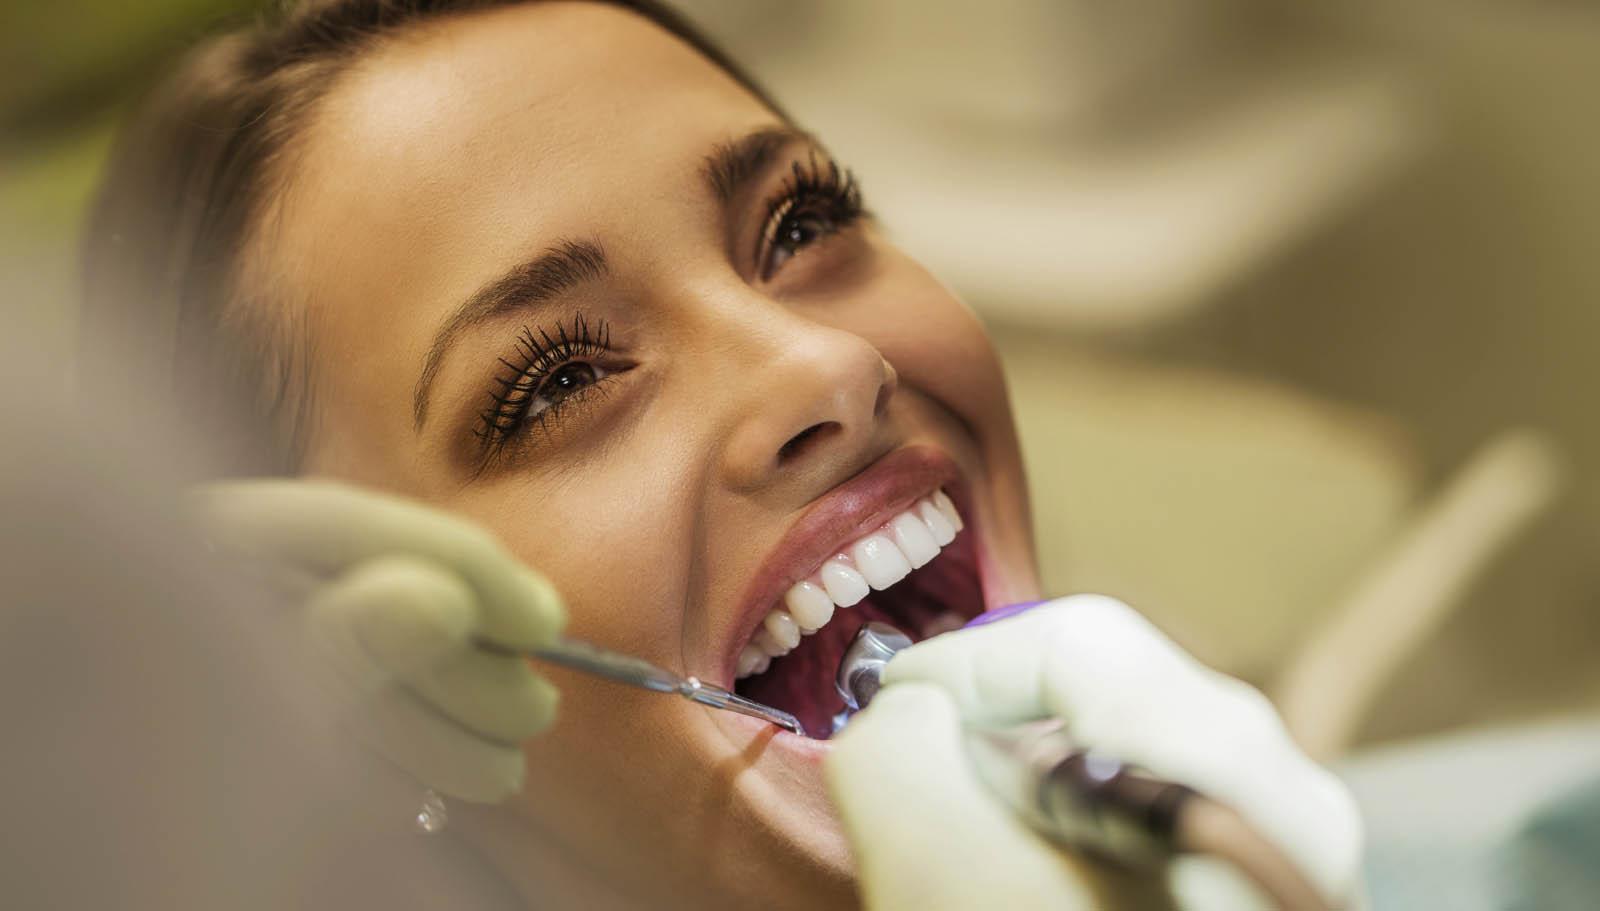 Etobicoke & Mississauga Complimentary Orthodontic Consultation